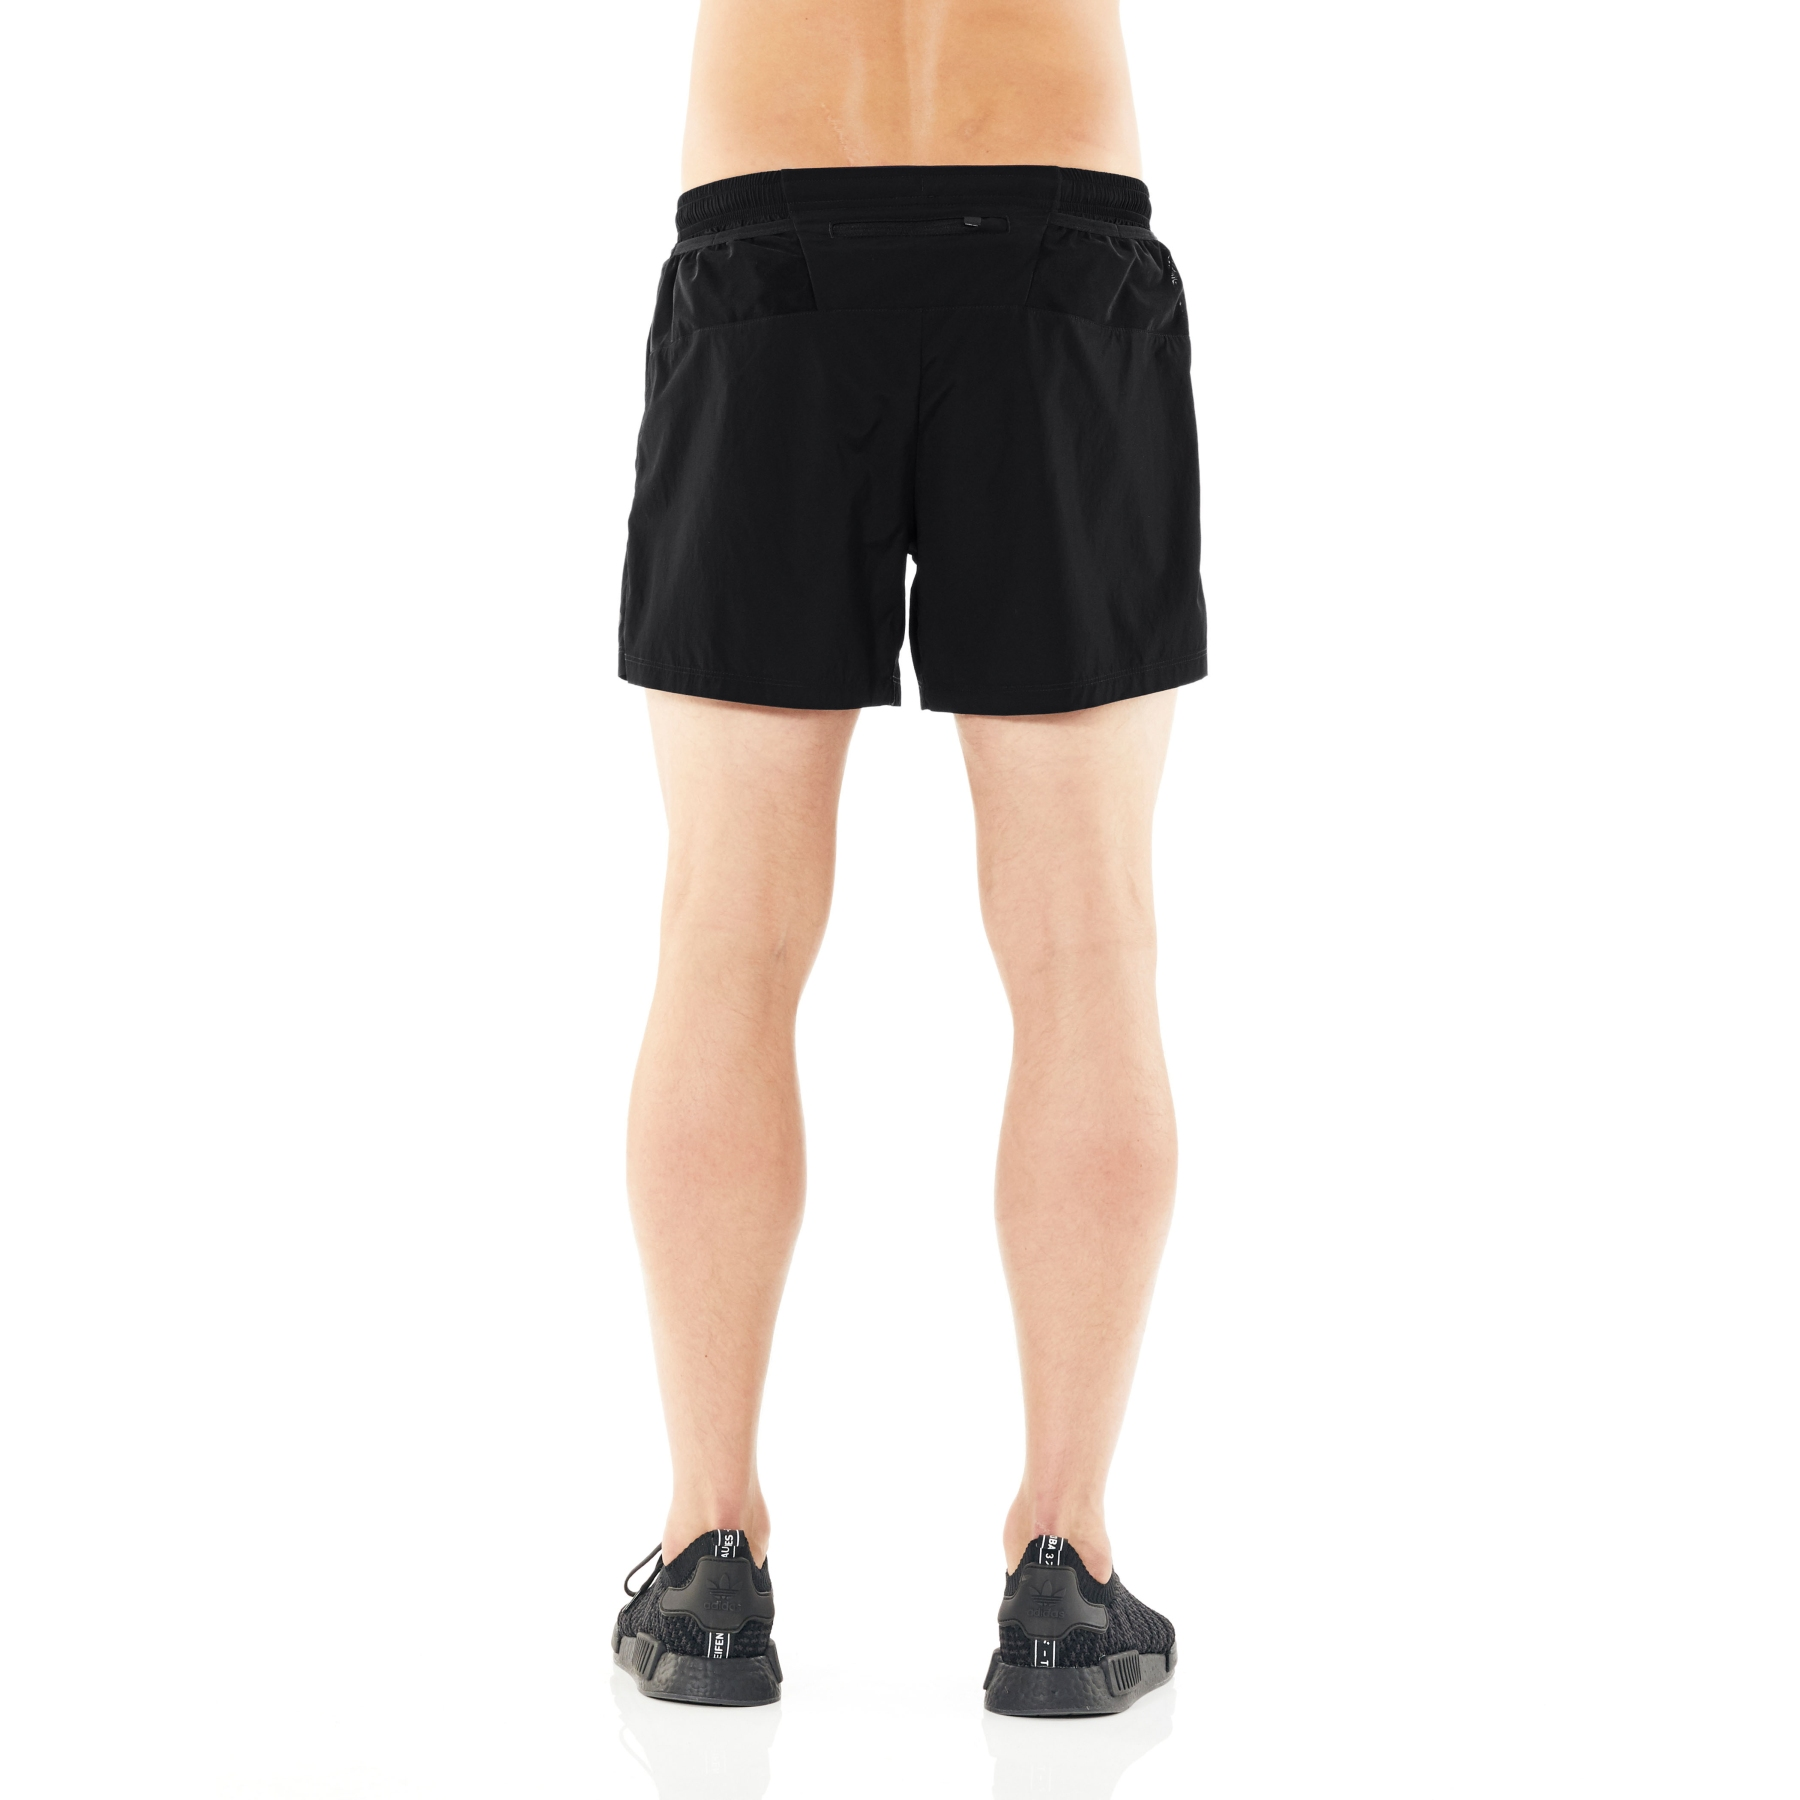 Bild von Icebreaker Impulse Running Herren Shorts - Black